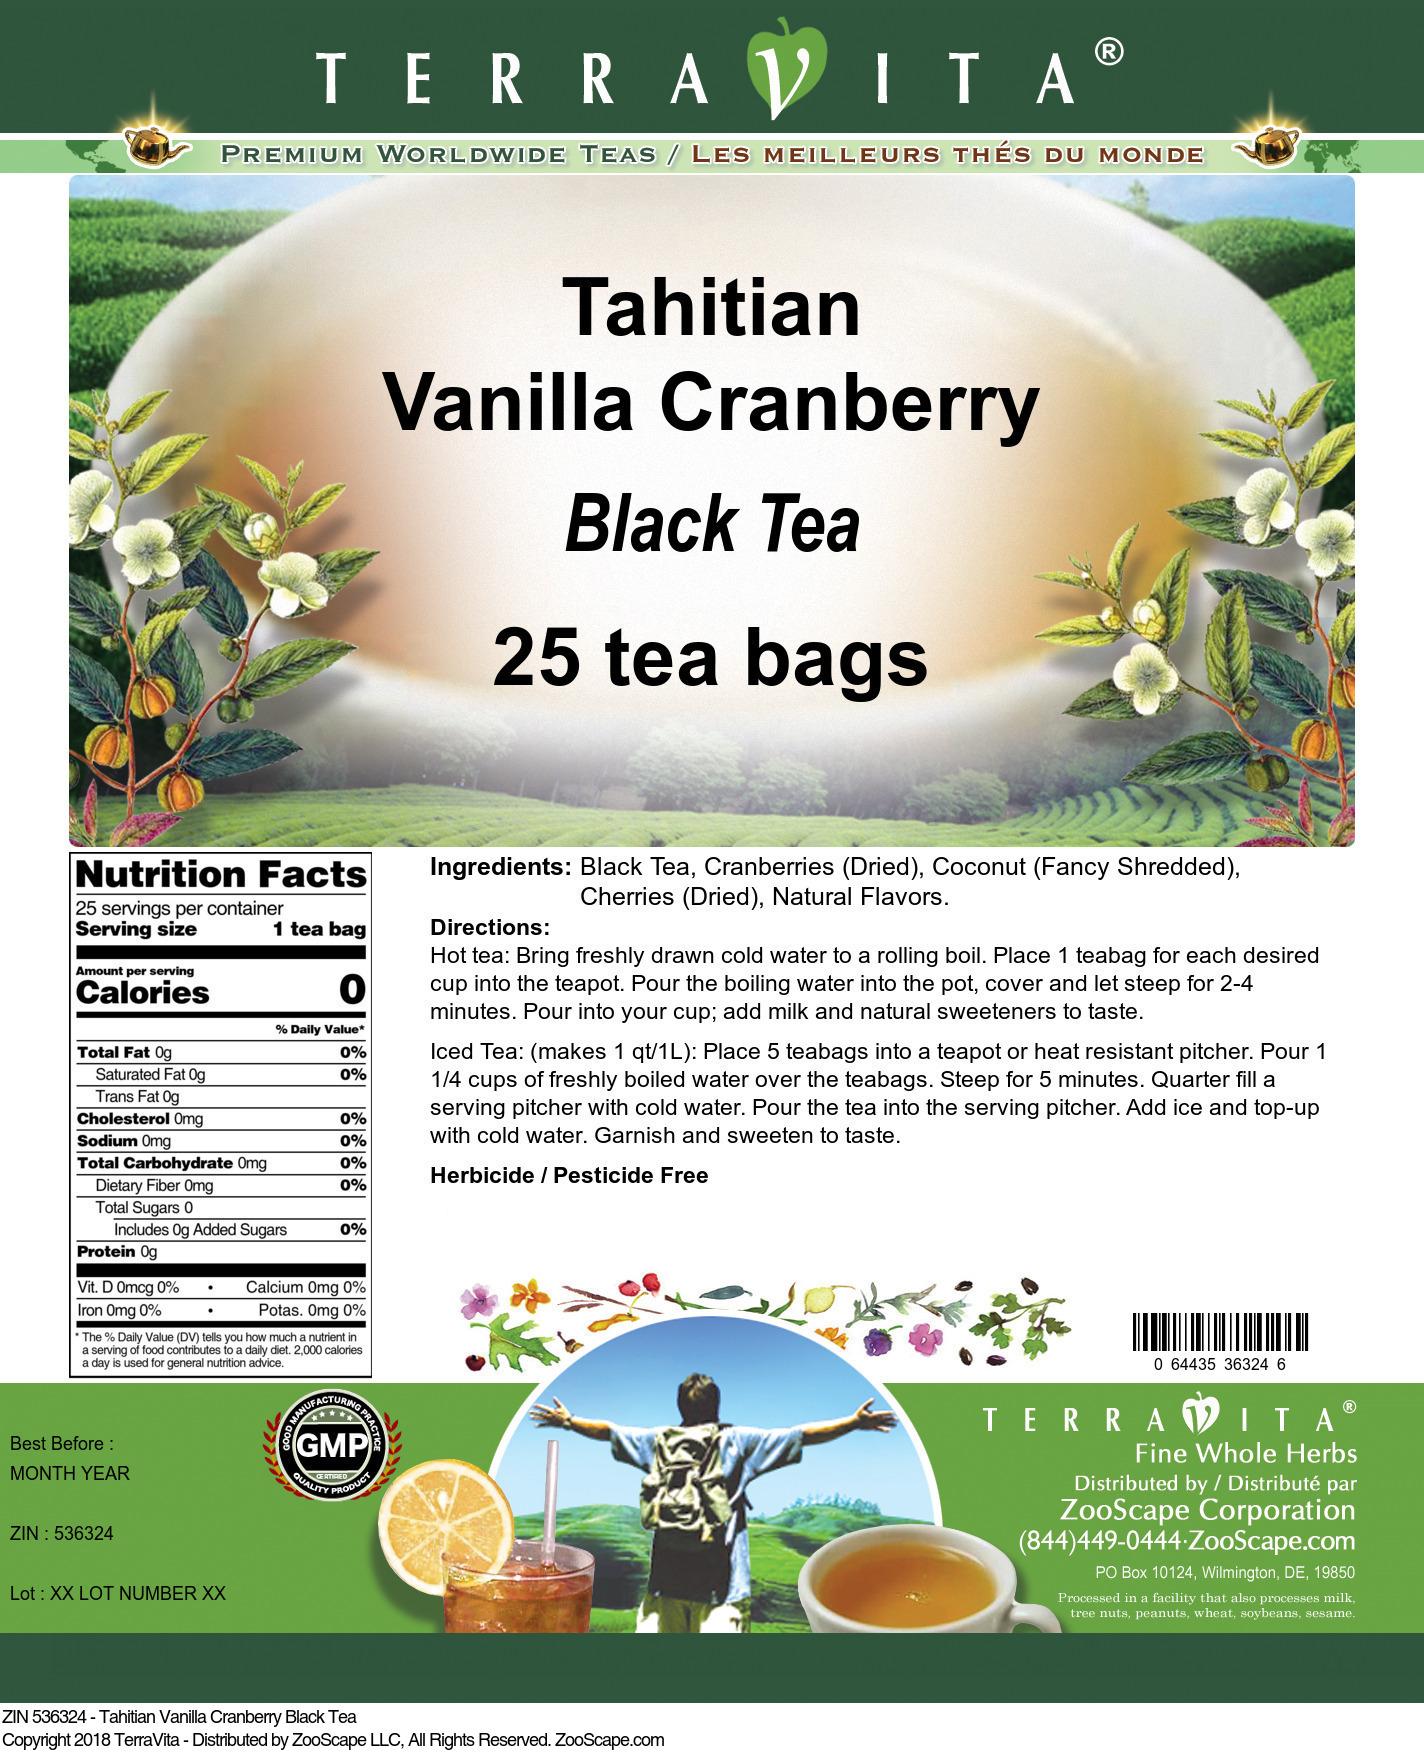 Tahitian Vanilla Cranberry Black Tea